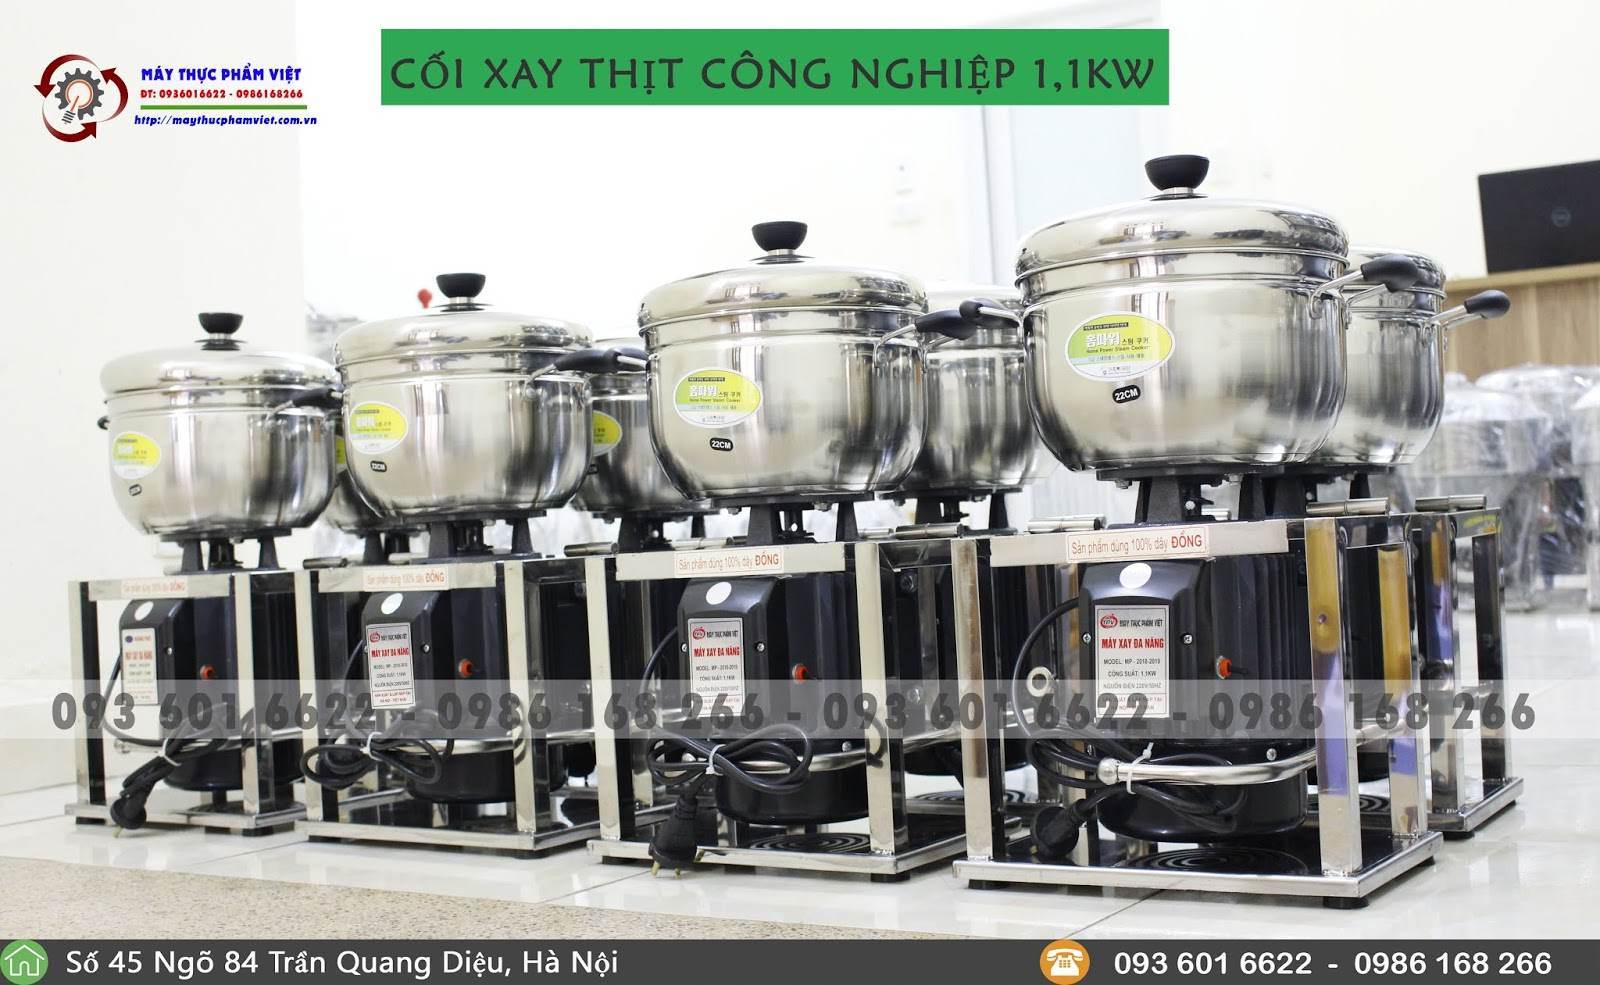 coi-xay-thit-cong-nghiep-mini-jpg.47907